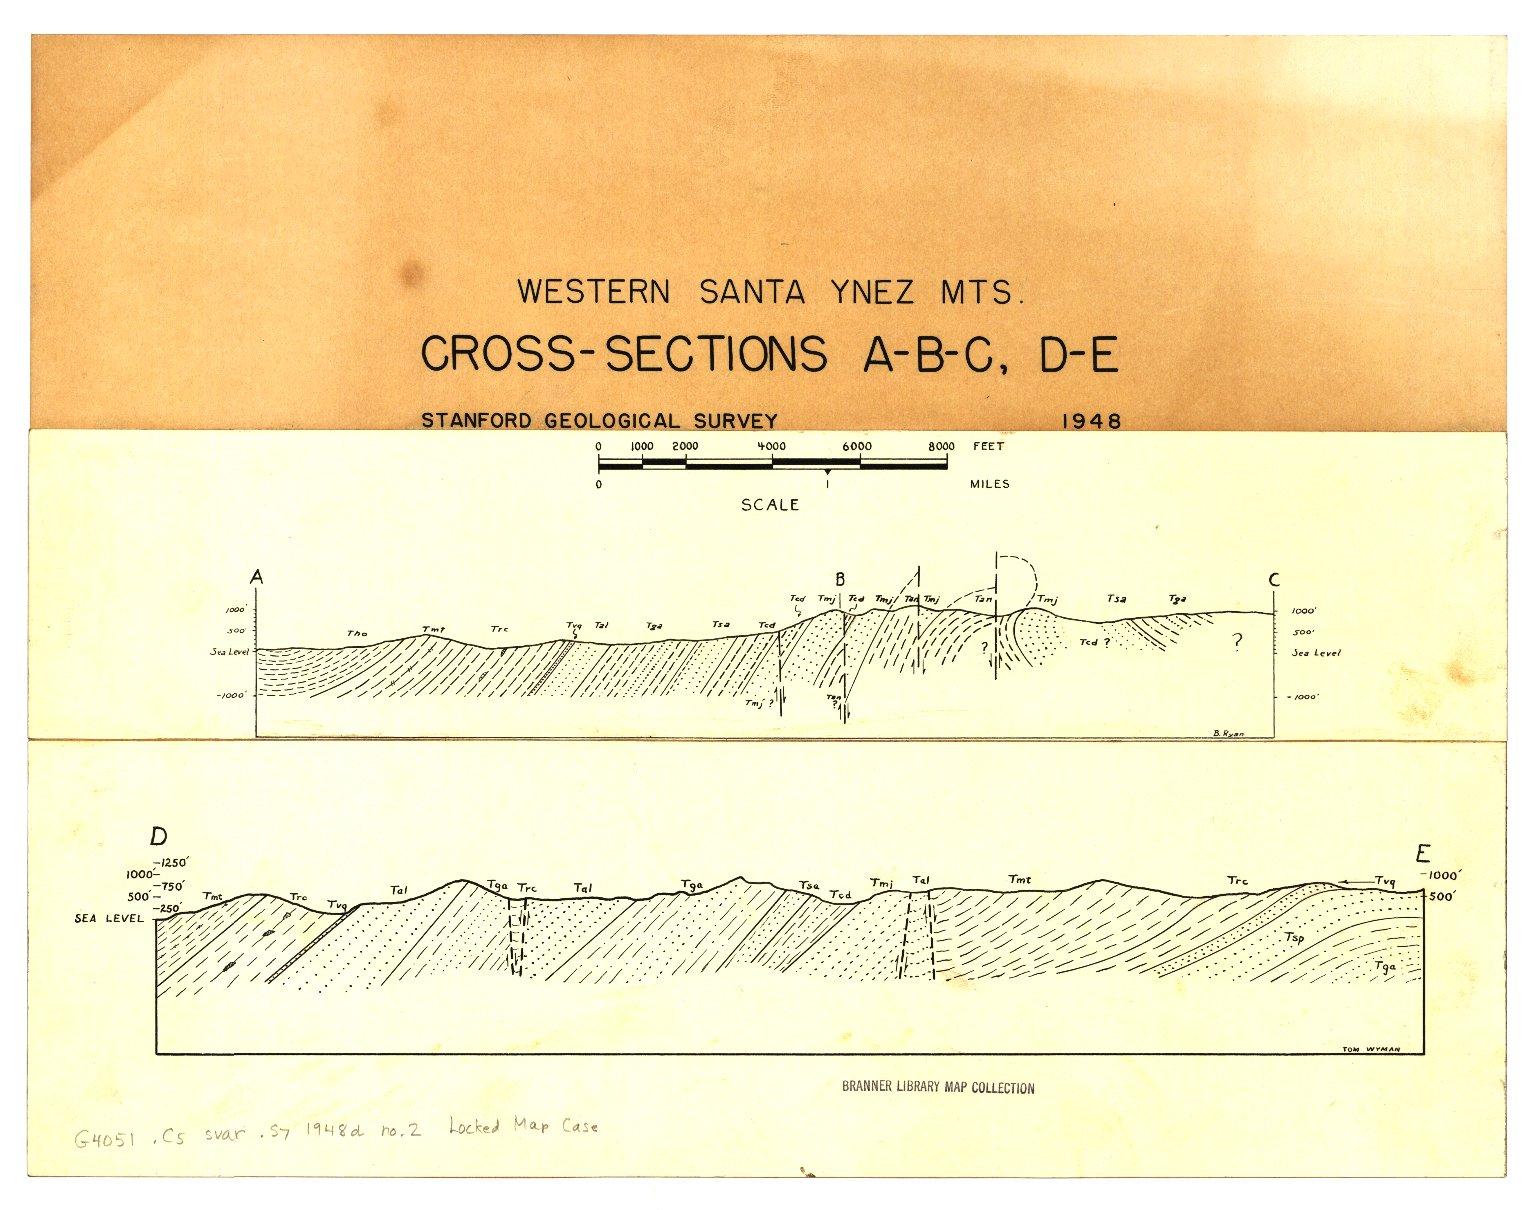 Geology of part of the western Santa Ynez Mountains, Santa Barbara County, California